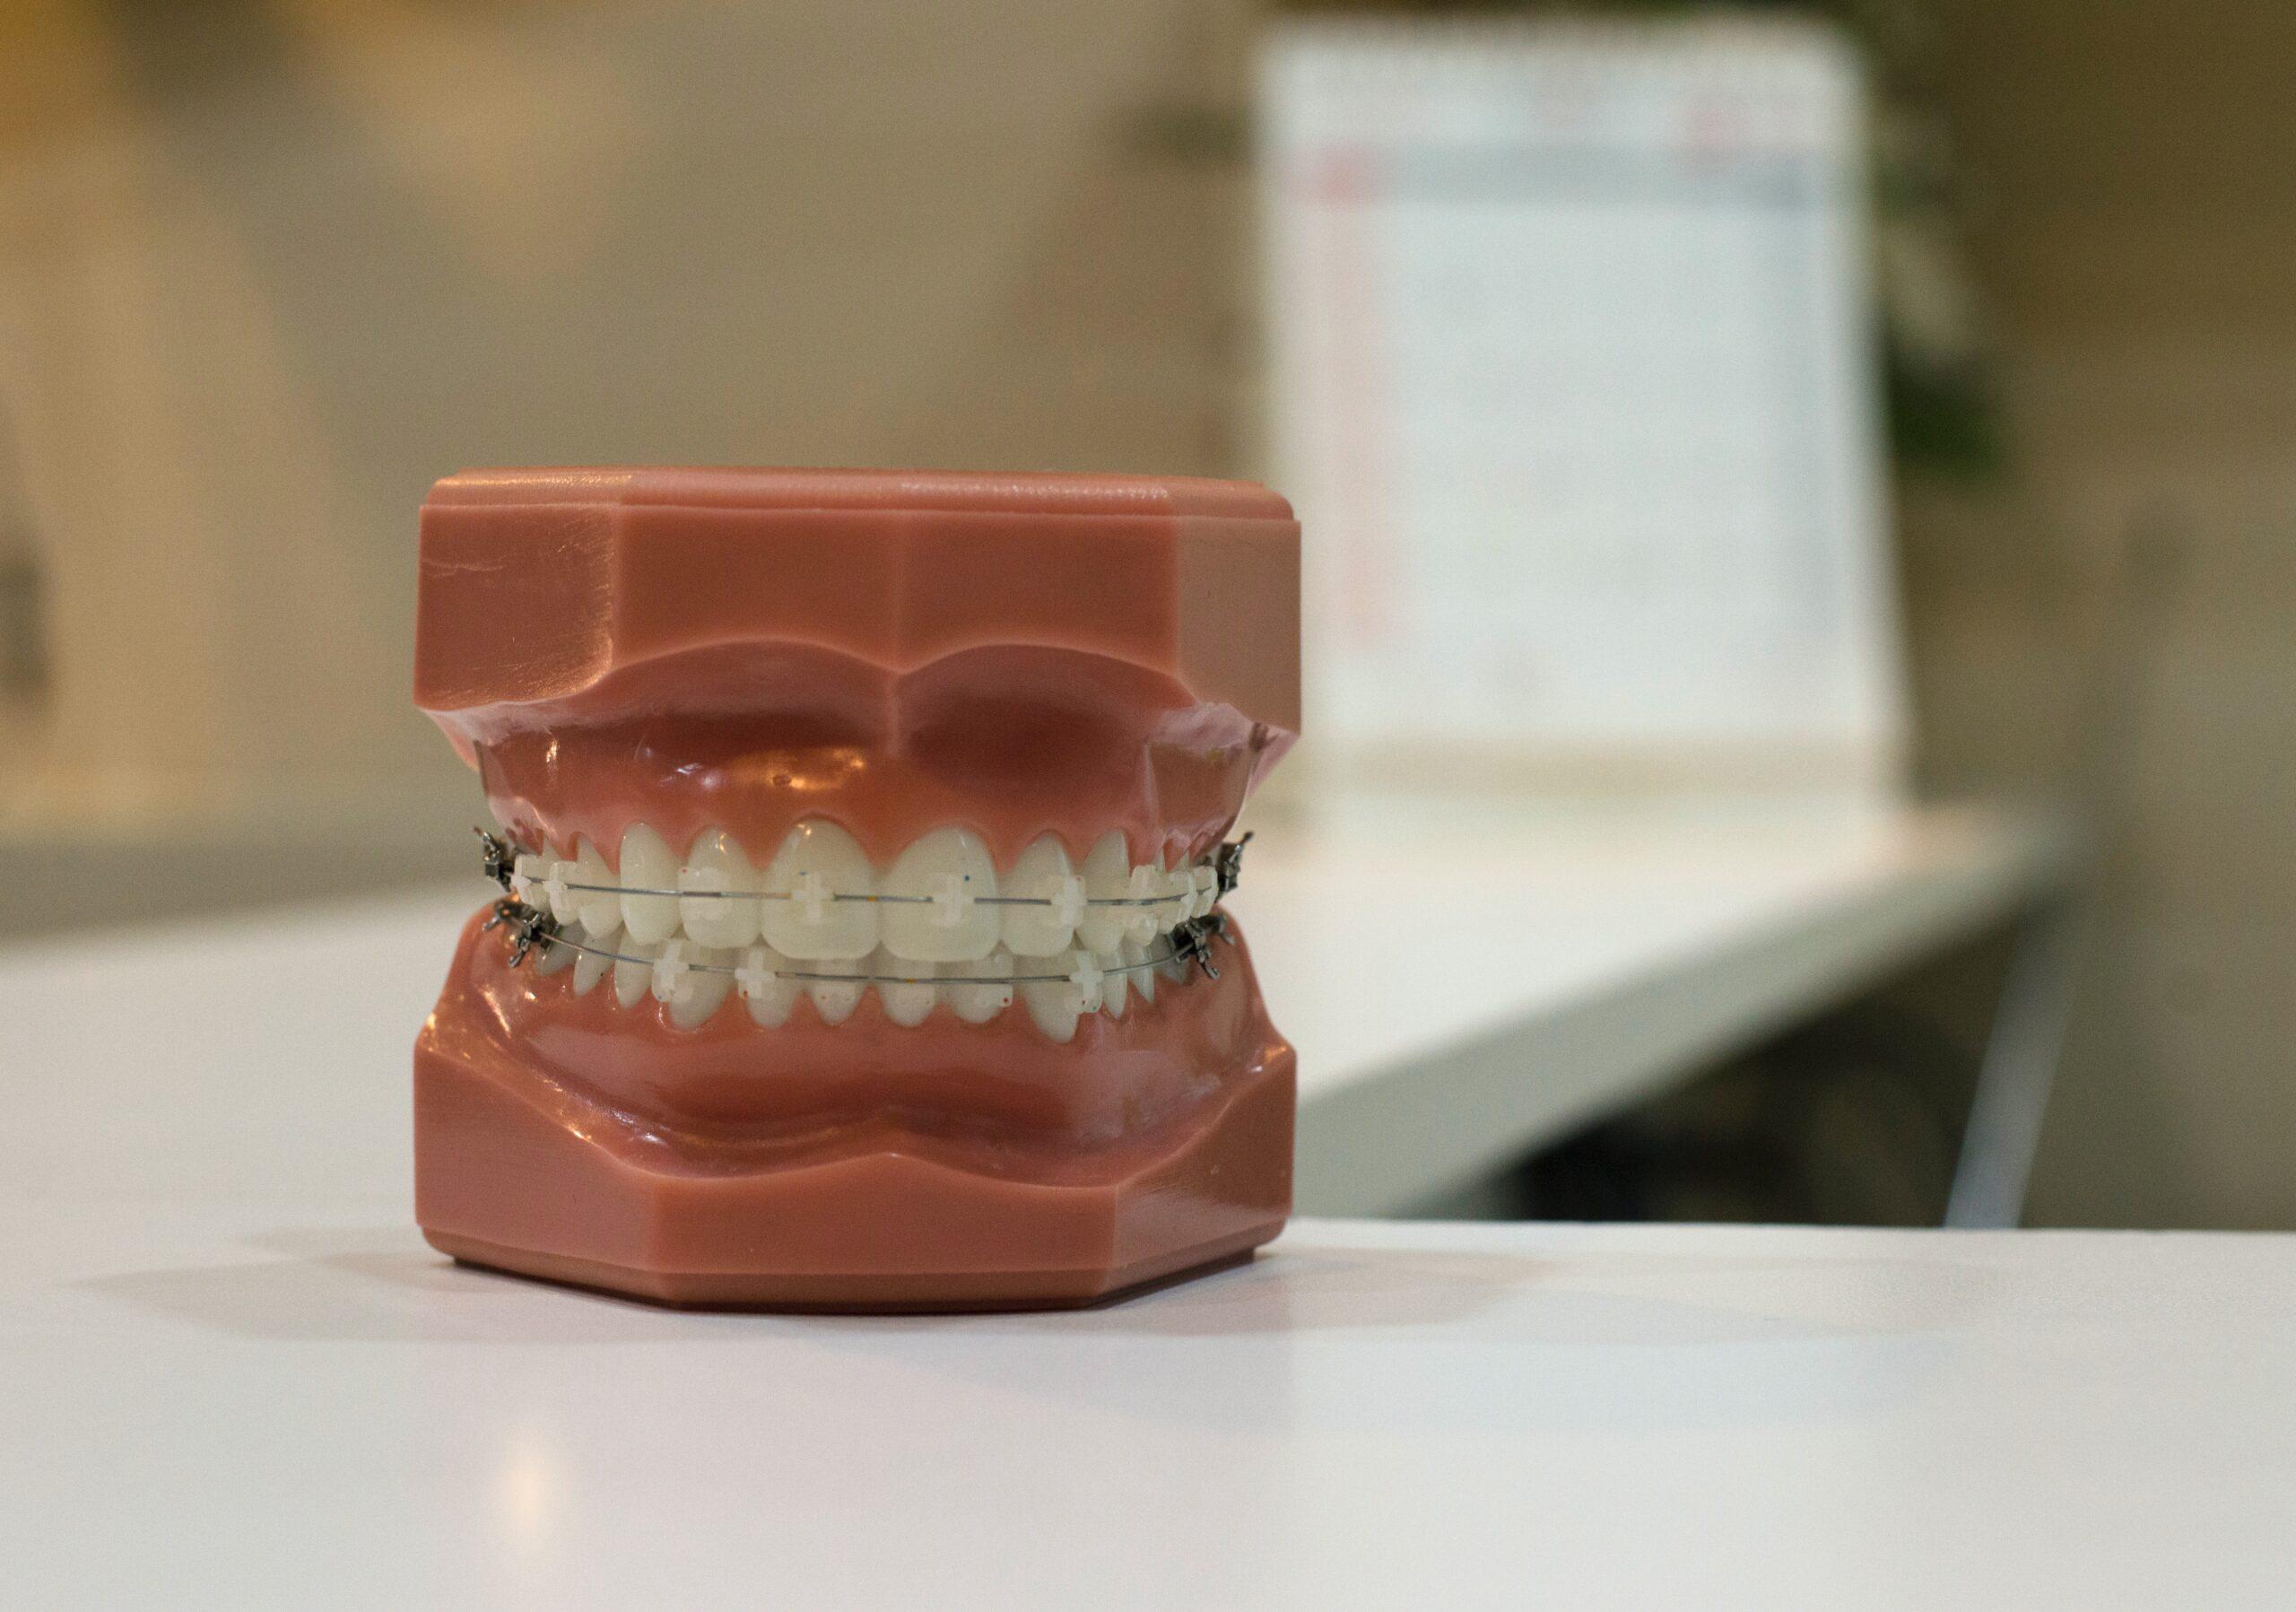 odontotecnici fiano